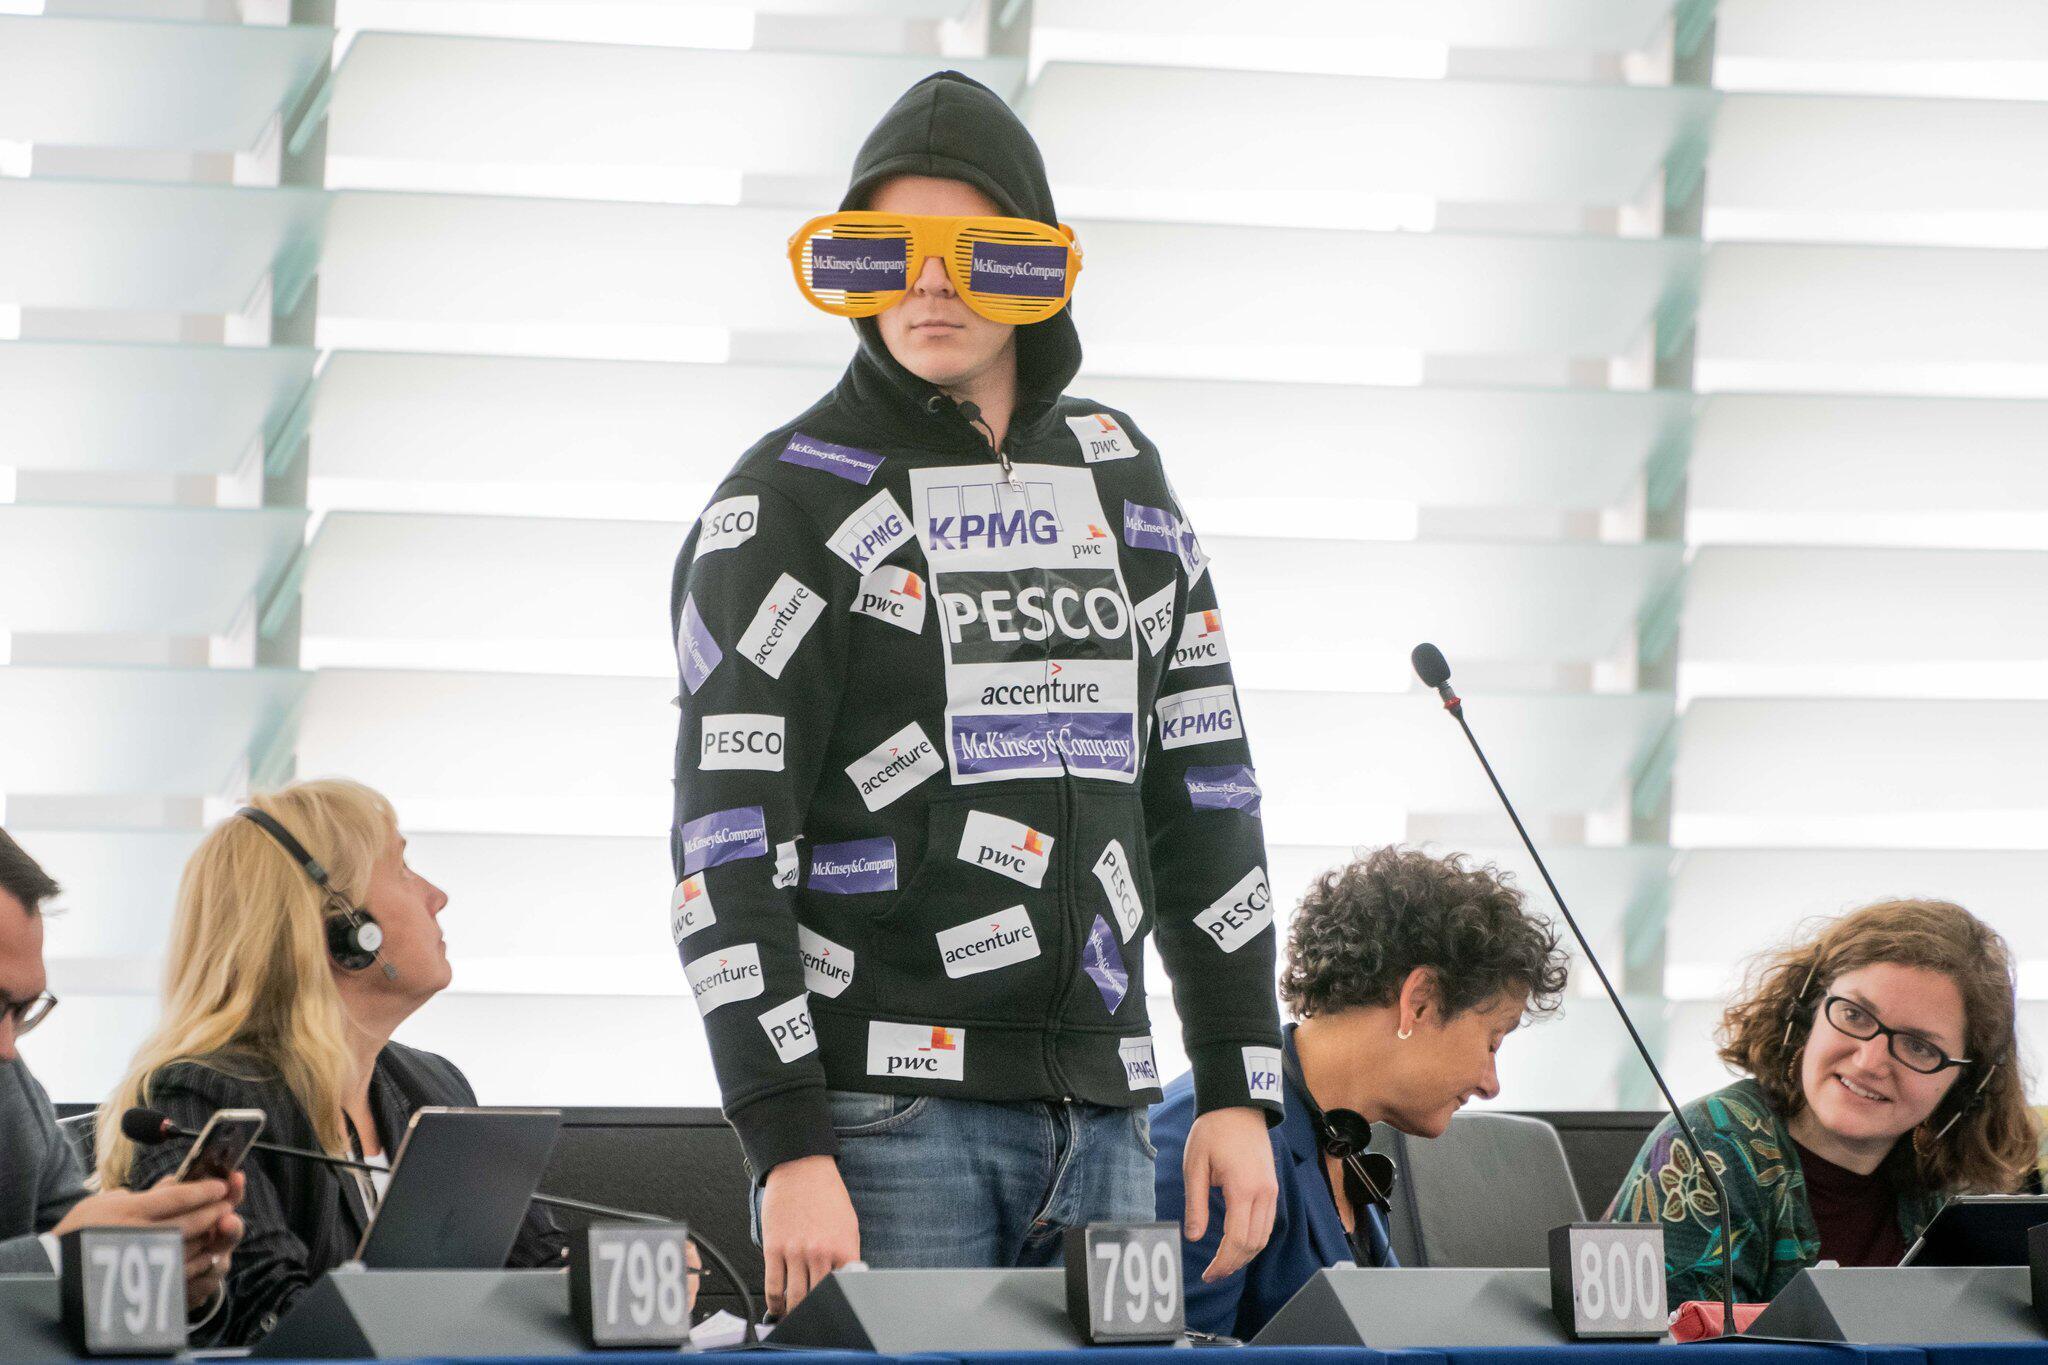 Bild zu Election of EU Commission President, Nico Semsrott